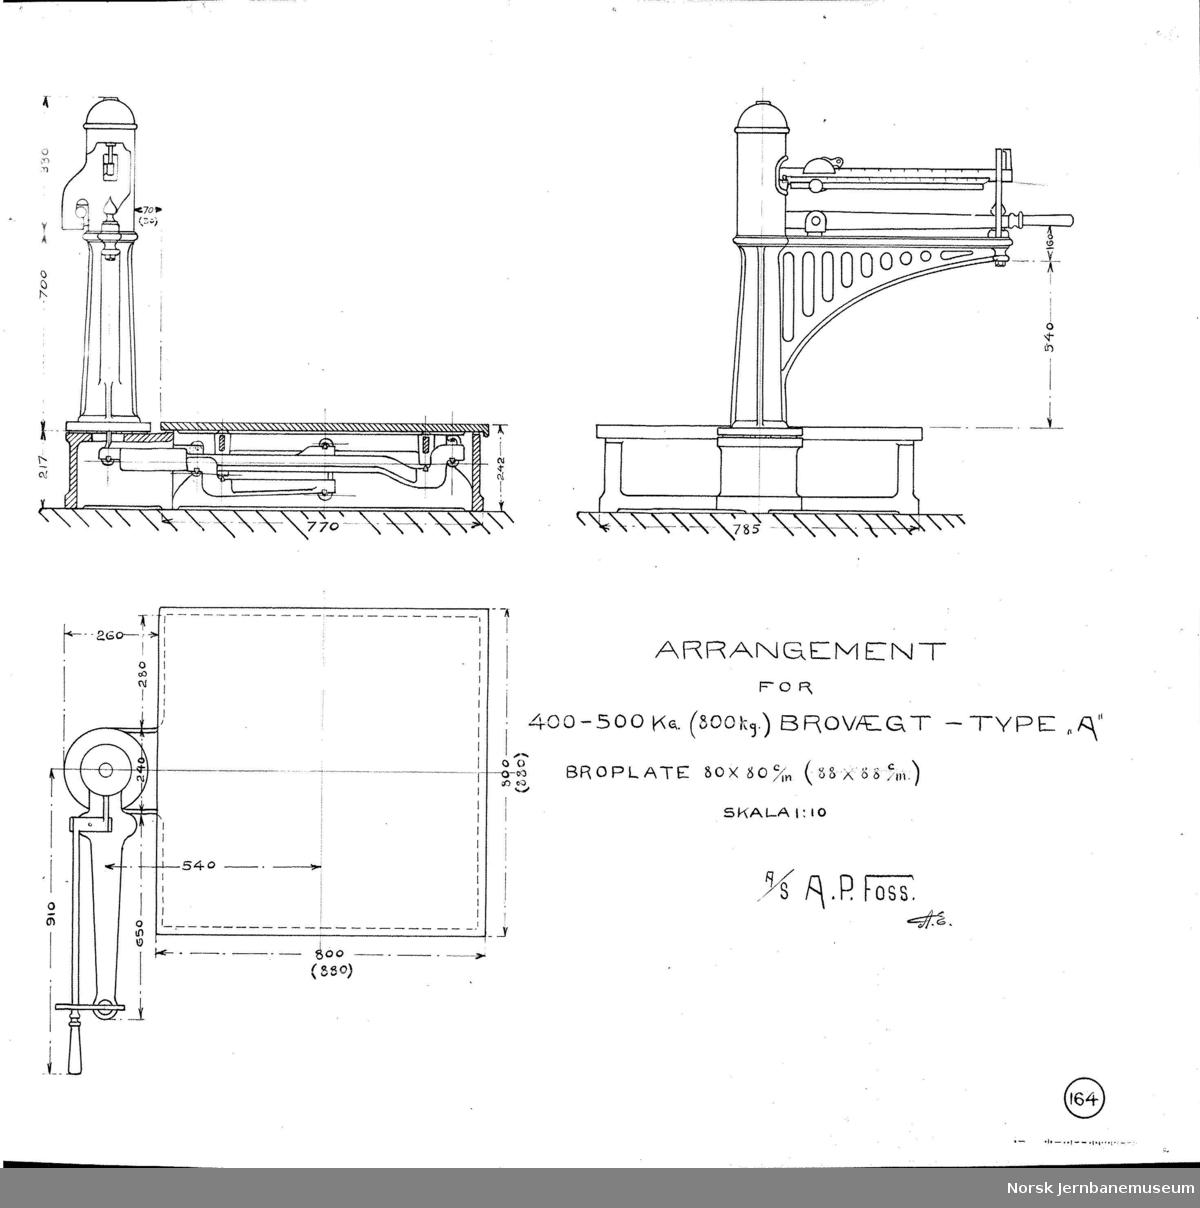 "Arrangement for 400-500 kg (800 kg.) brovægt - type ""A"" A. P. Foss tegning no. 164"